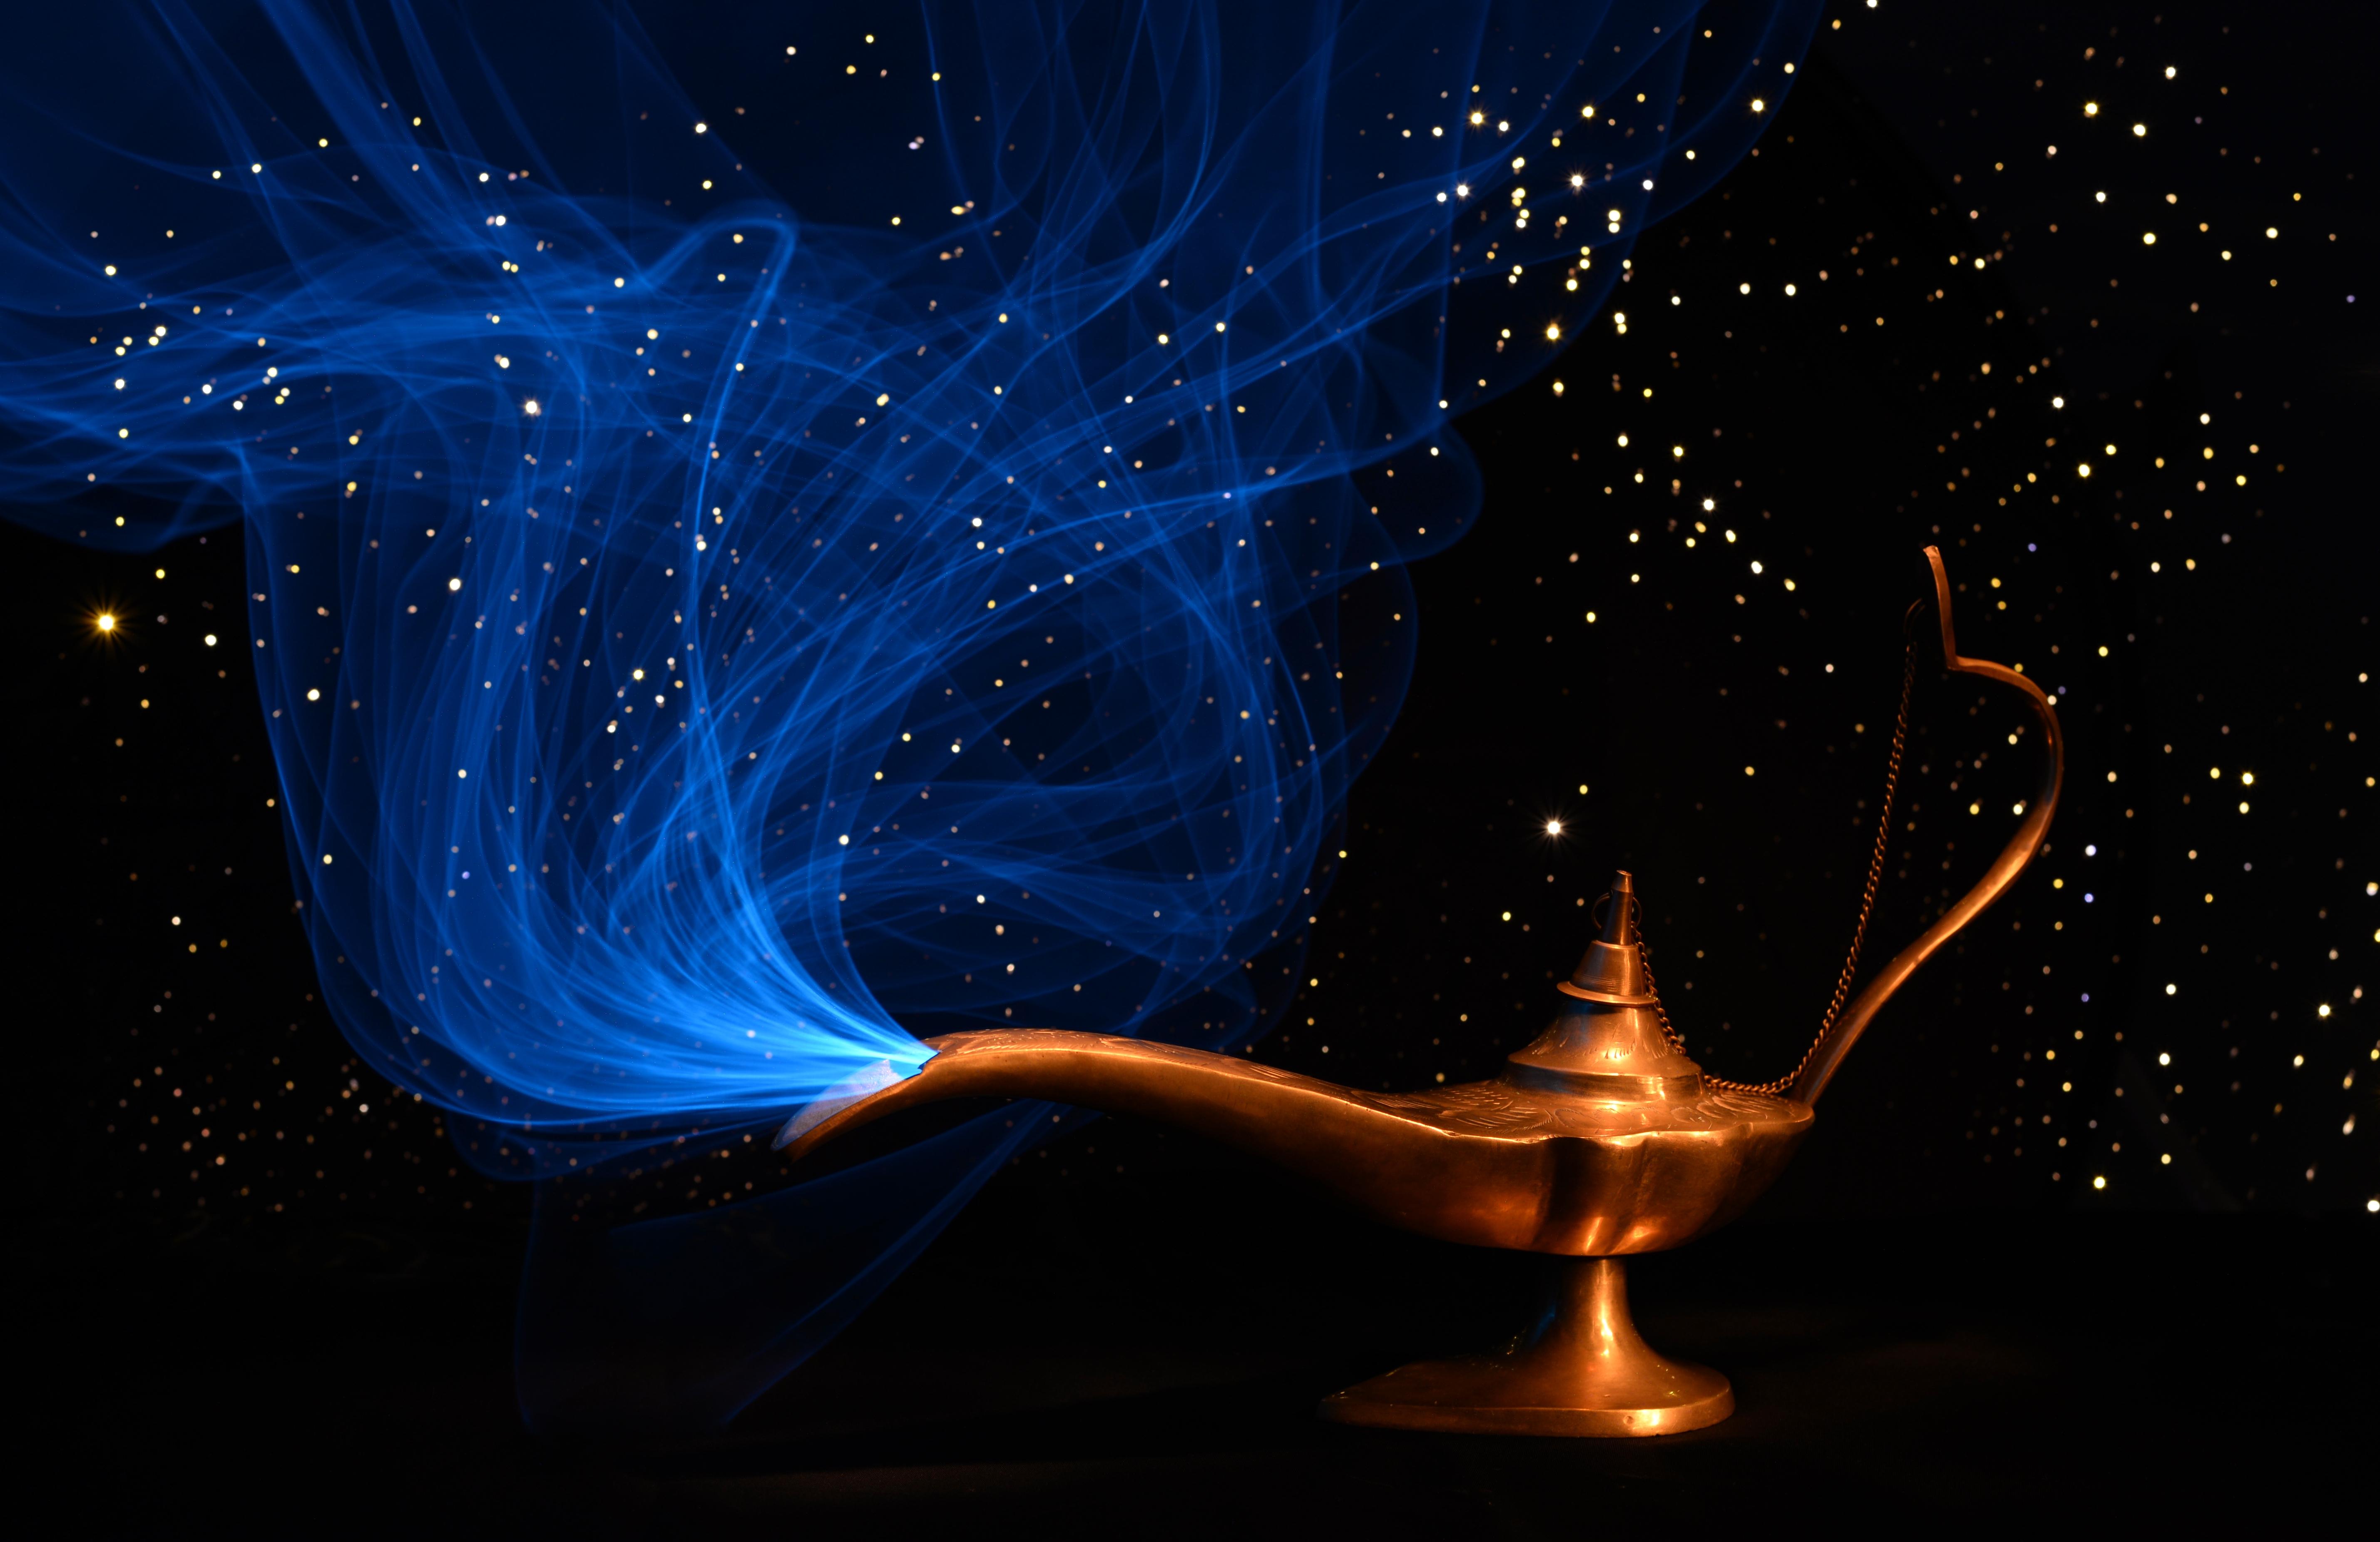 Papel De Parede Agua C 233 U Fuma 231 A Azul Lumin 225 Ria